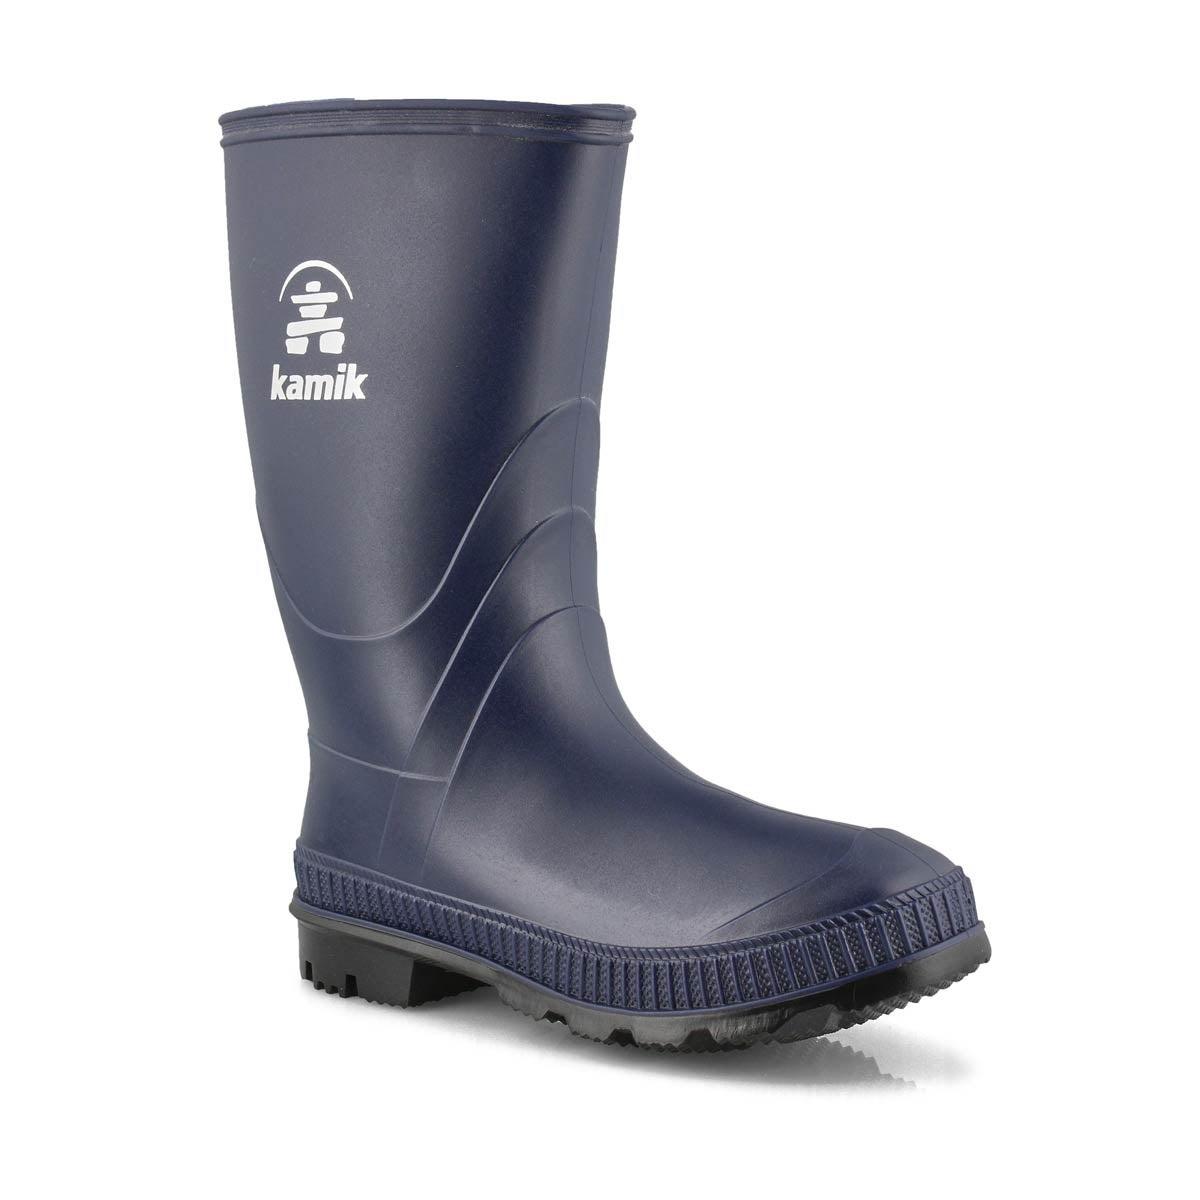 Boys' STOMP navy waterproof rain boots